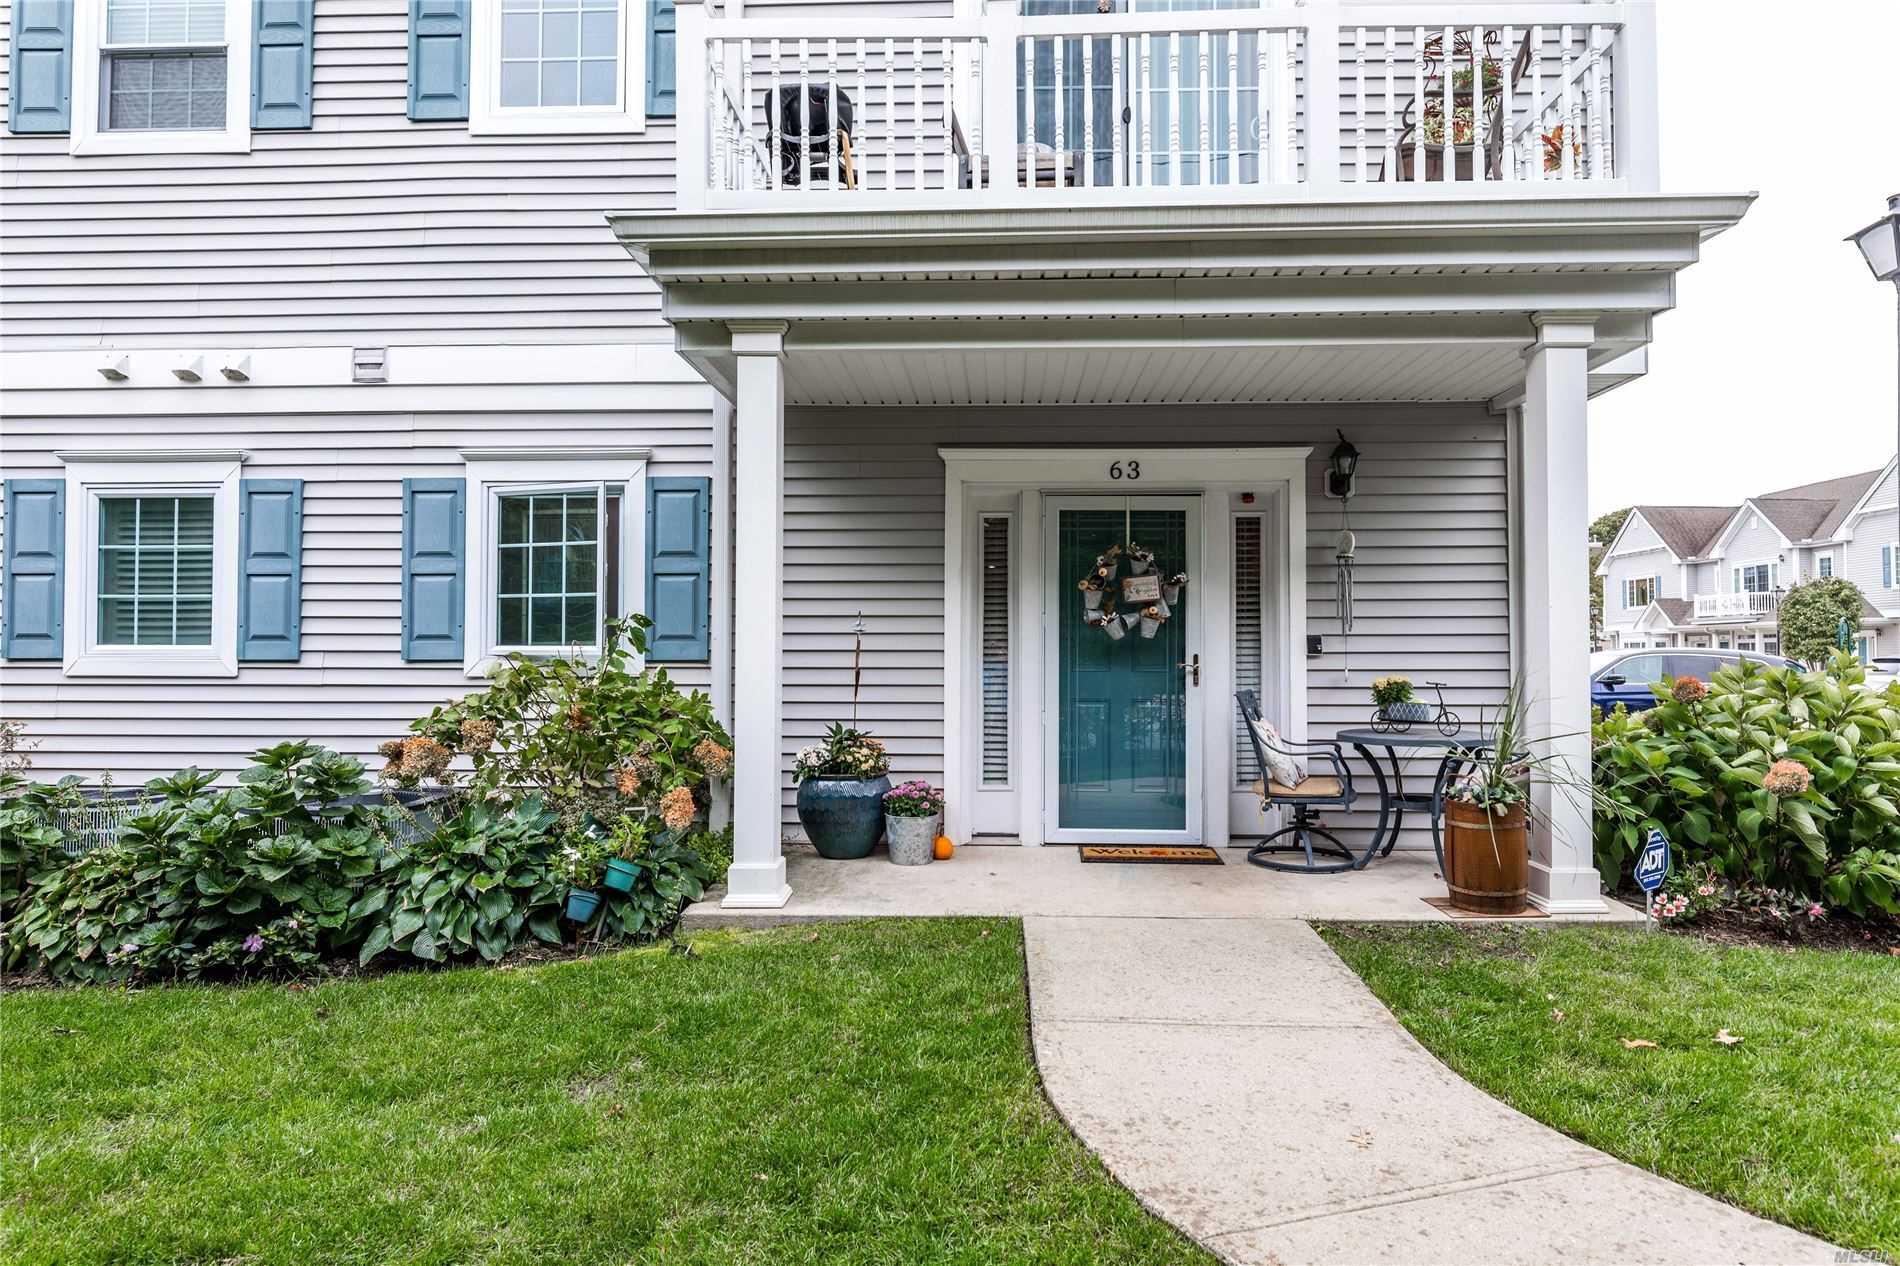 Property for sale at 63 Barbara Ct, Amityville NY 11701, Amityville,  New York 11701